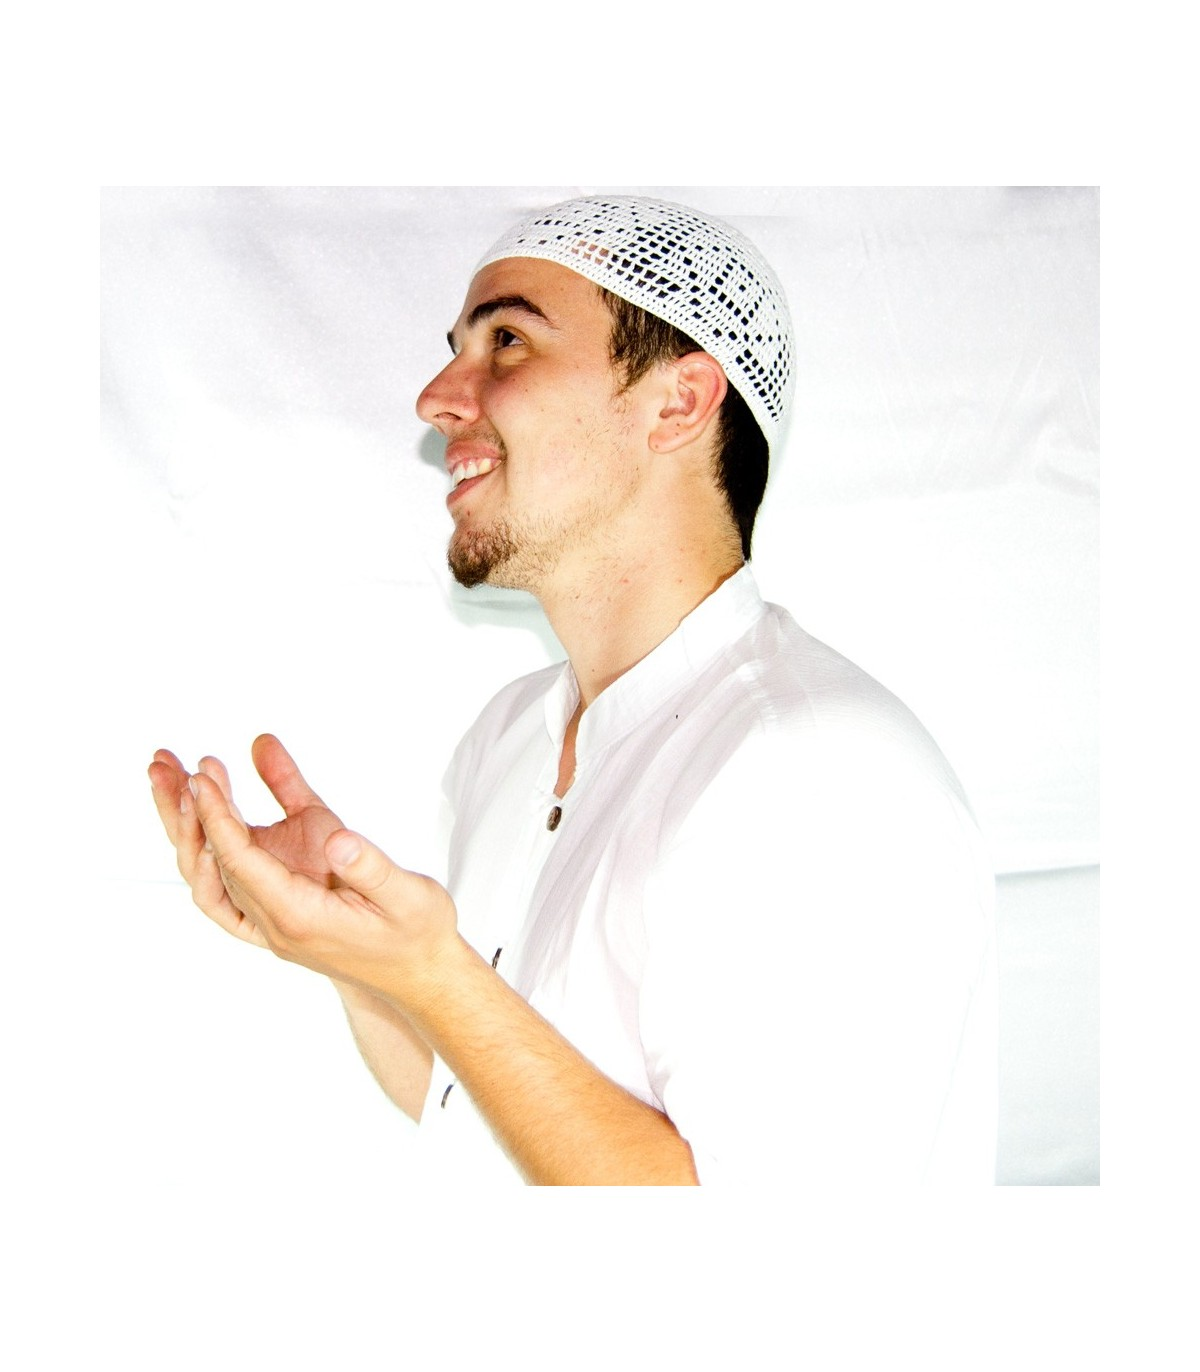 Gorros Salat Algodón Blanco - Talla Unica - Mosaico. Gorro Arabe Fez Rojo  Flecos - Gorro Marroquí - Gorro Moro 9b283f89efc